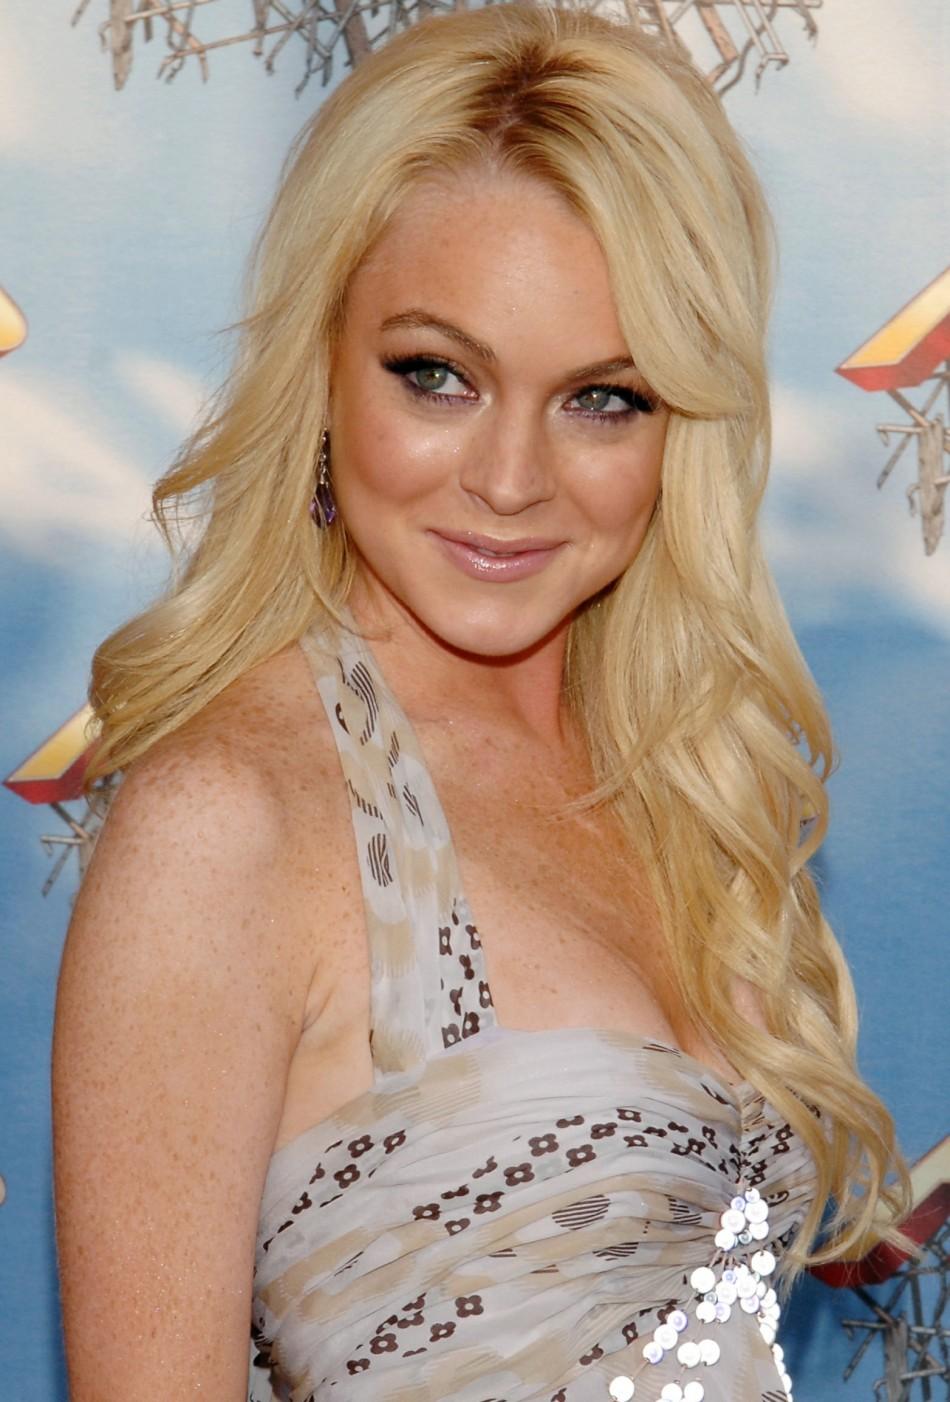 Lindsay Lohan Playboy Nude Photos Leaked on Twitter Lindsay Lohan